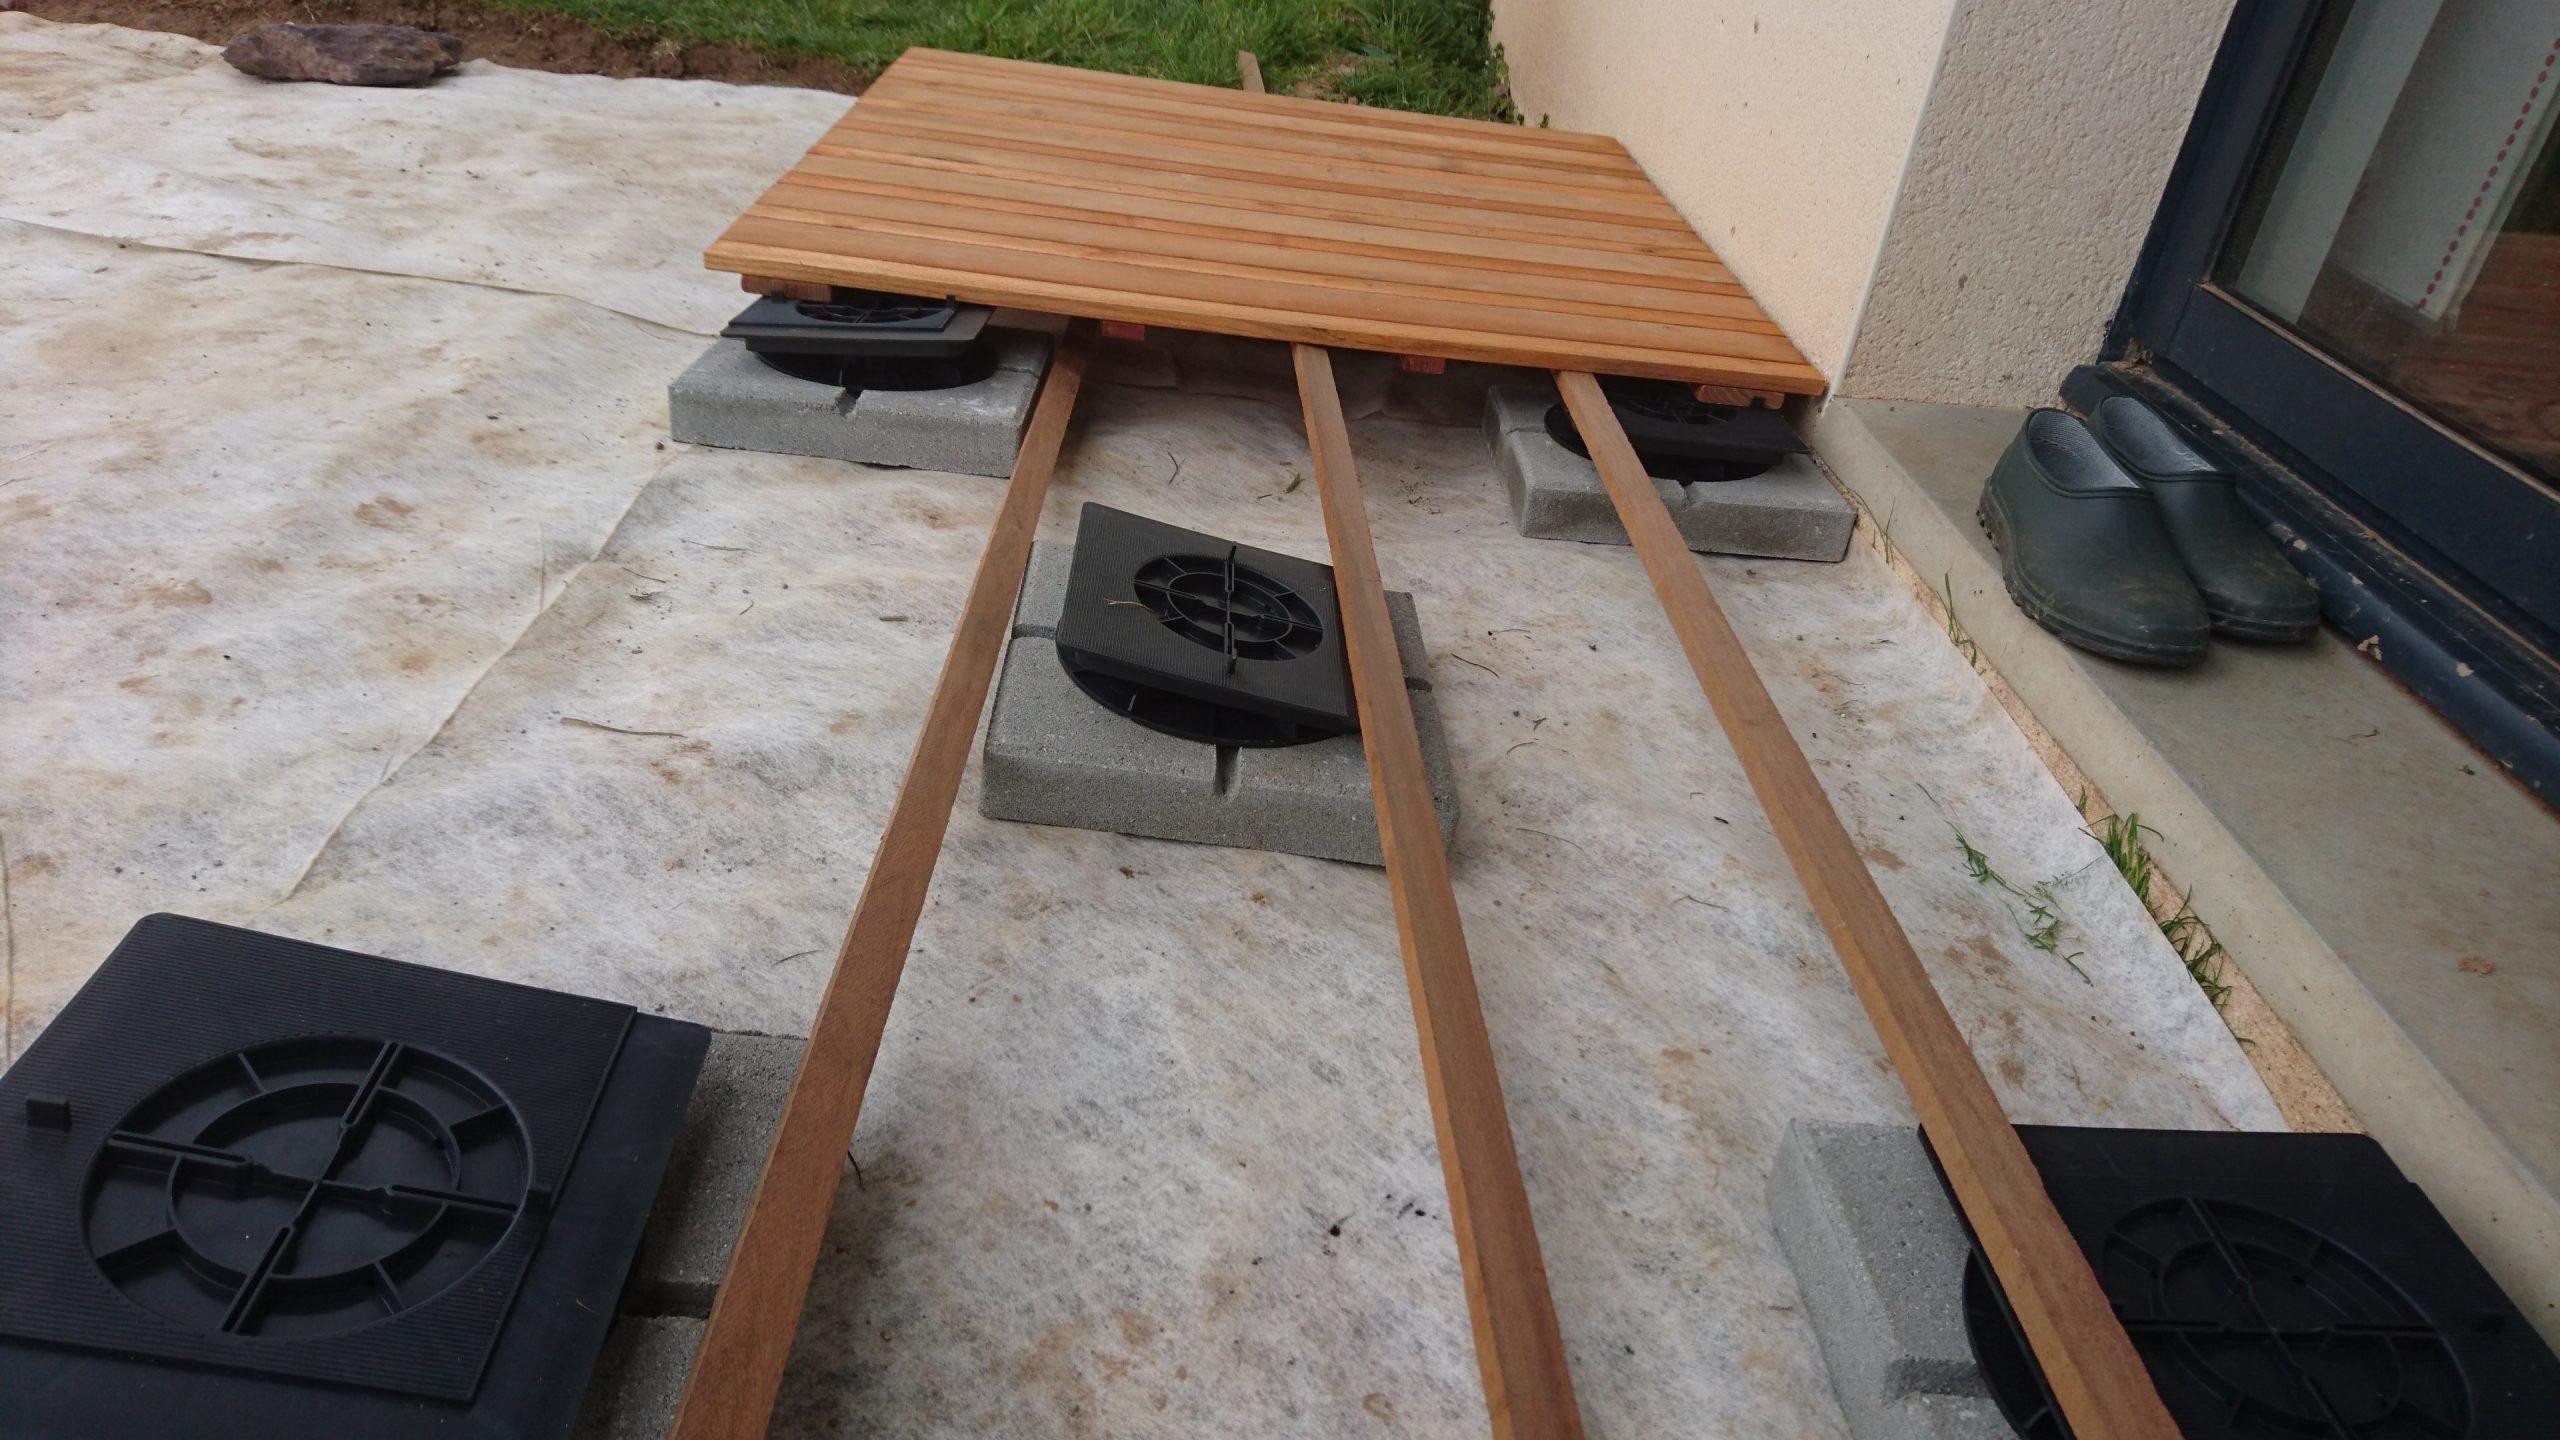 Construire Sa Terrasse Sur De La Terre Meuble - Construction ... serapportantà Caillebotis 100X100 Castorama